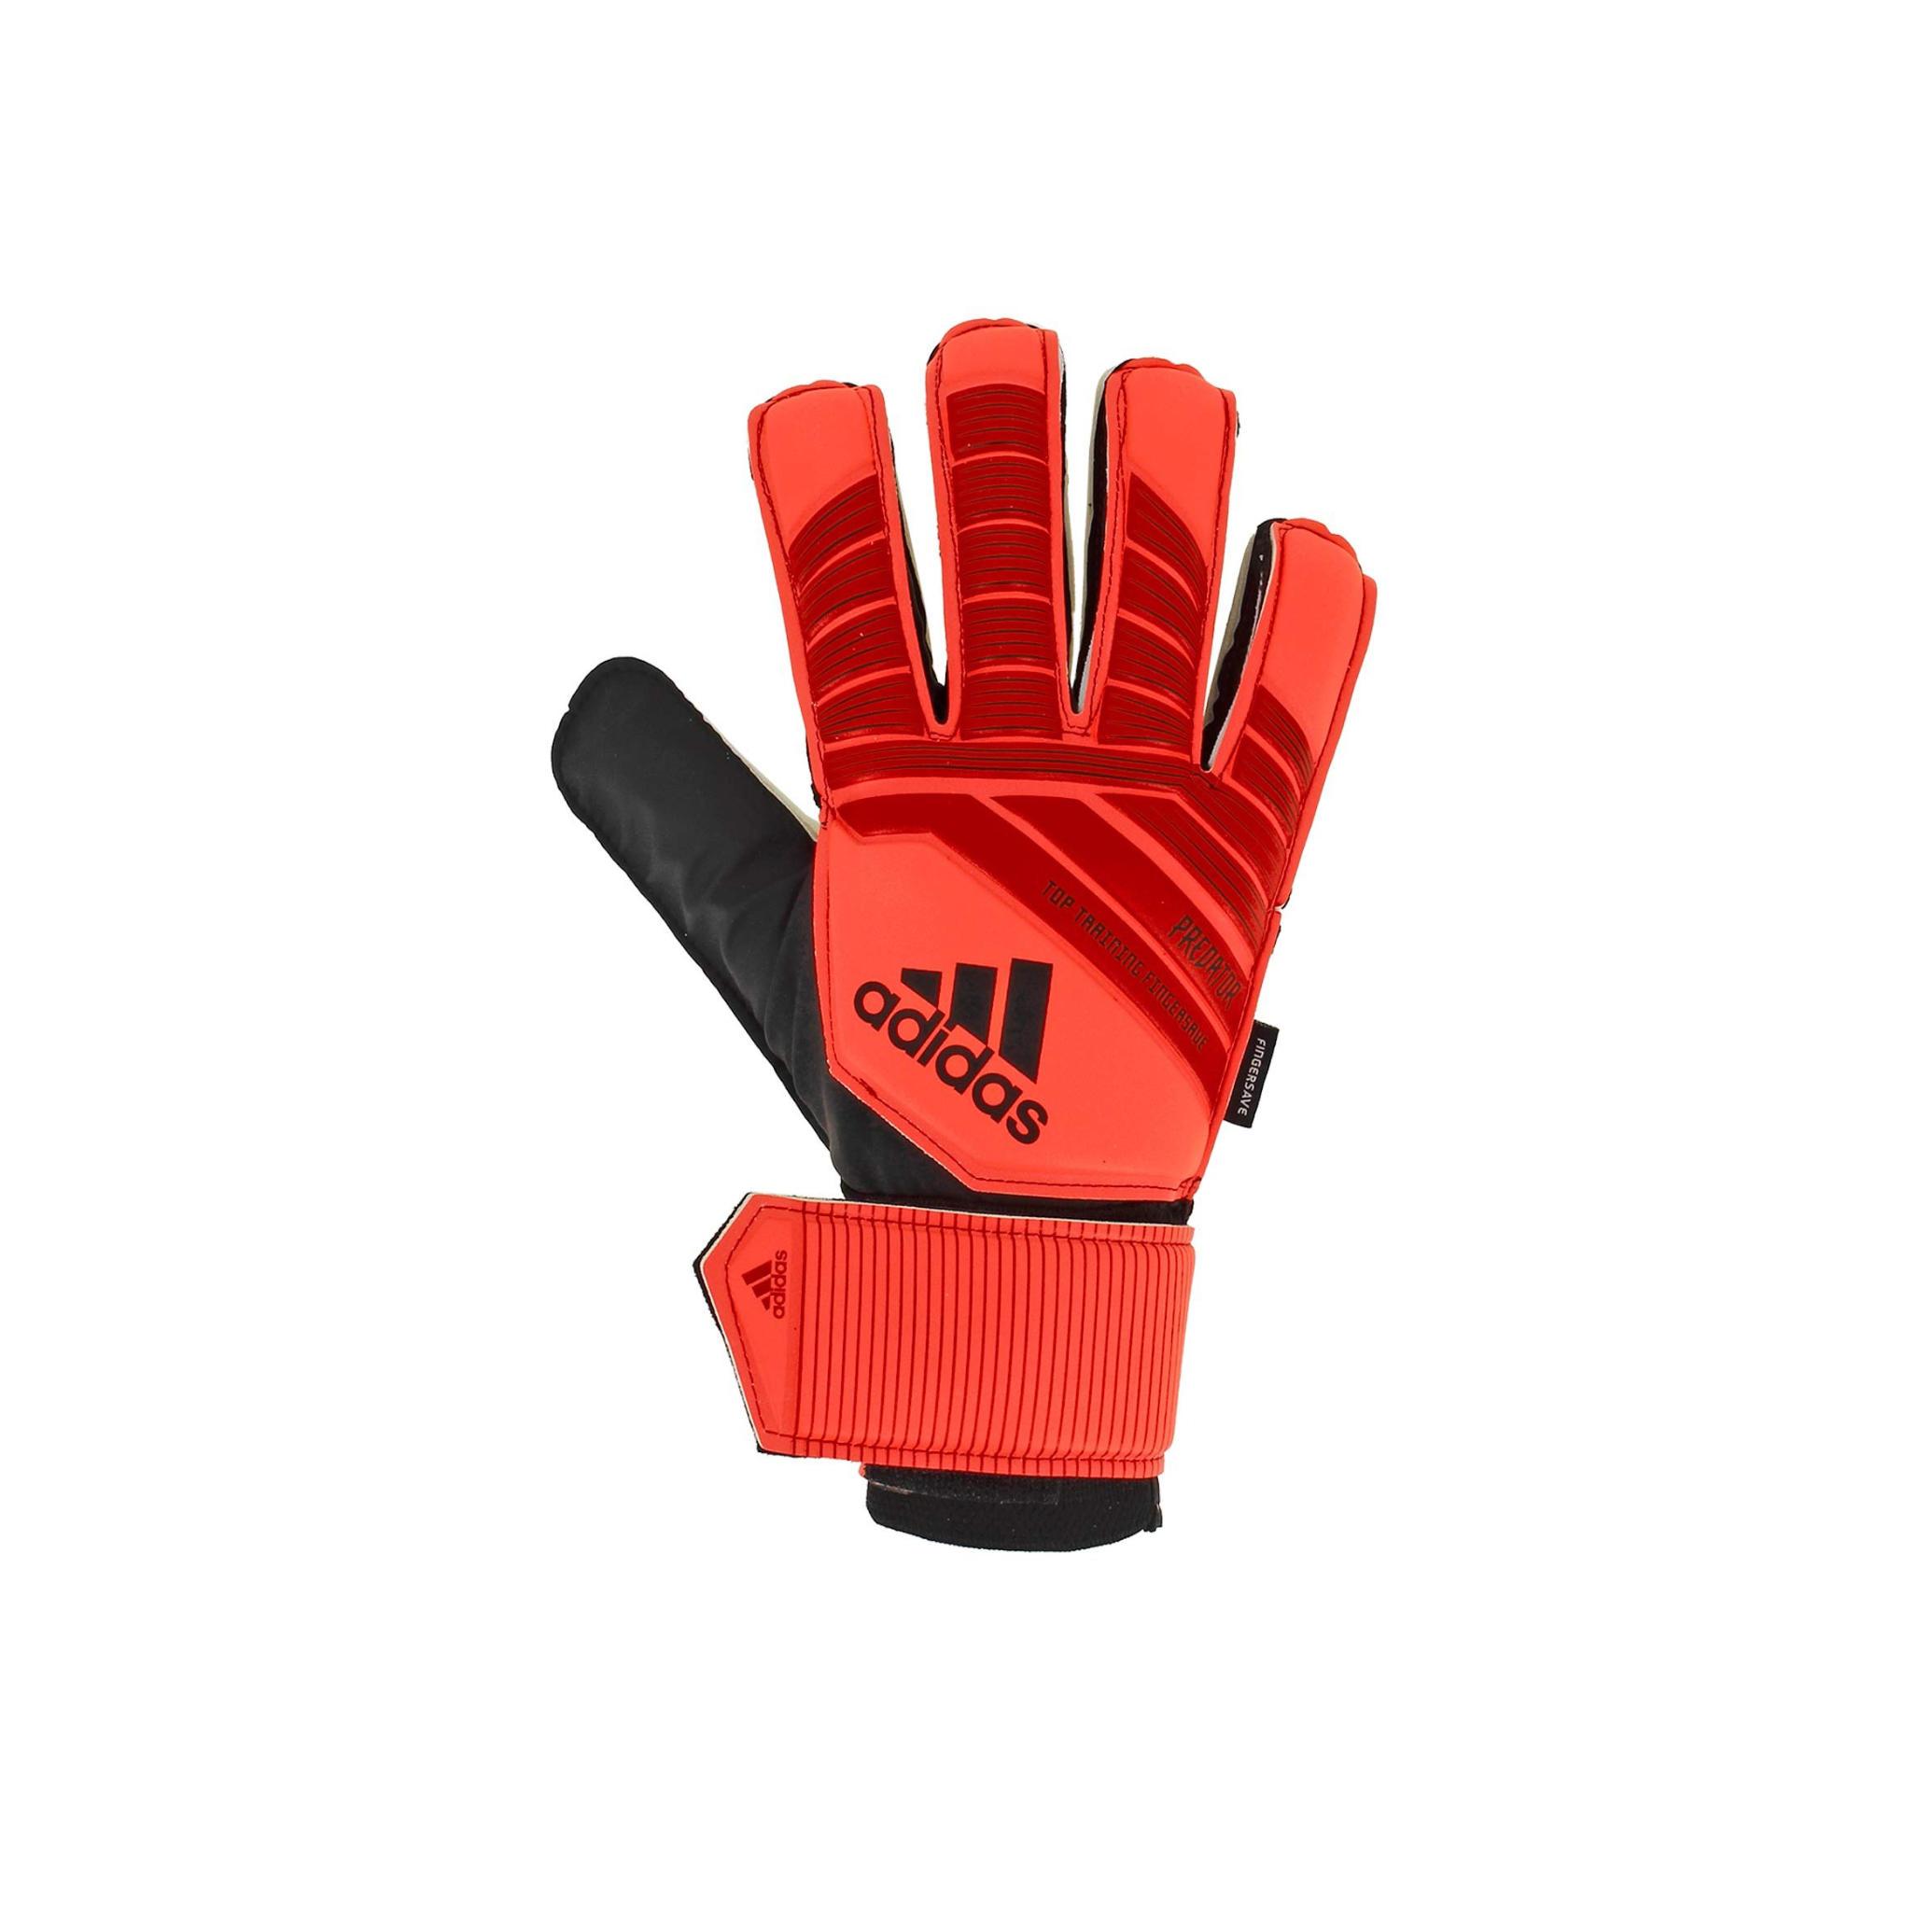 Adidas Keepershandschoenen Predator Top Training Fingersave rood